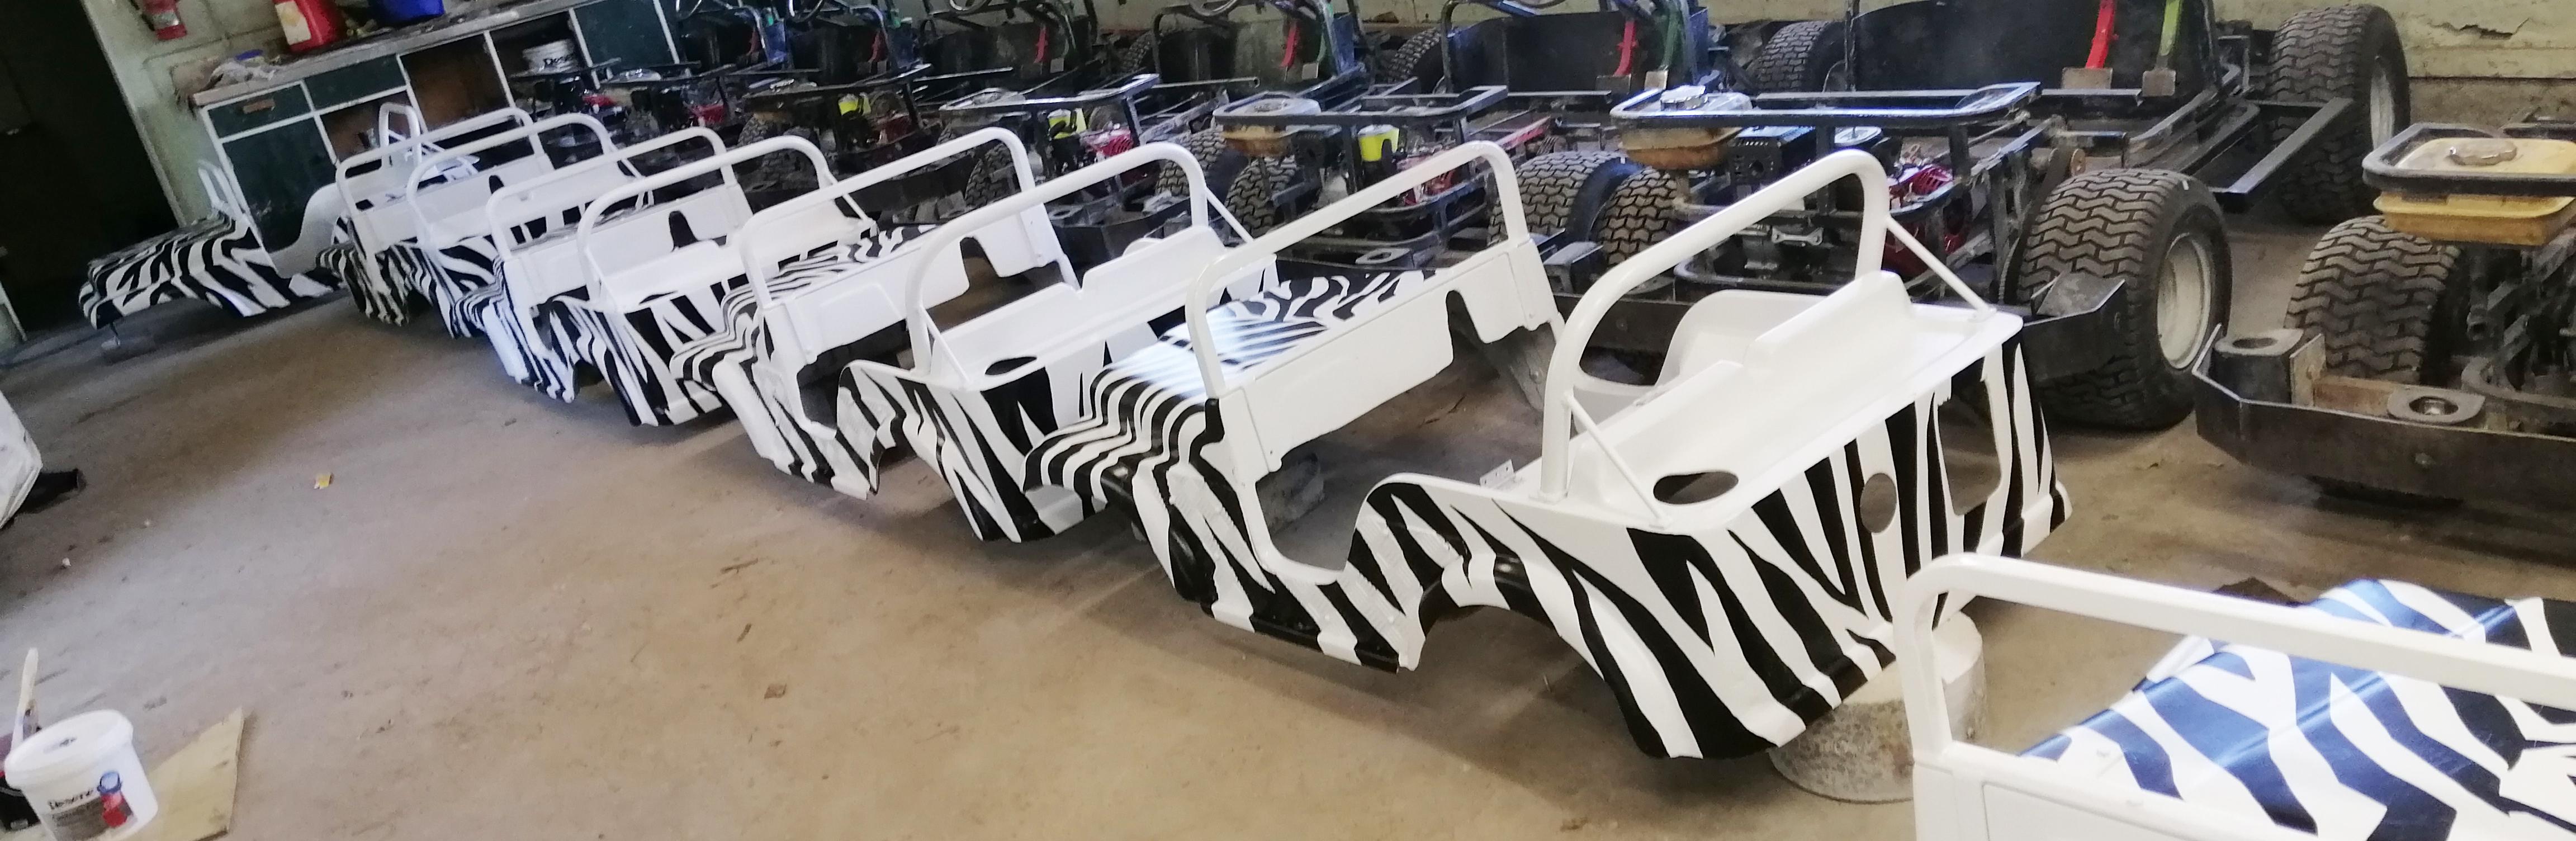 zebra paint 1